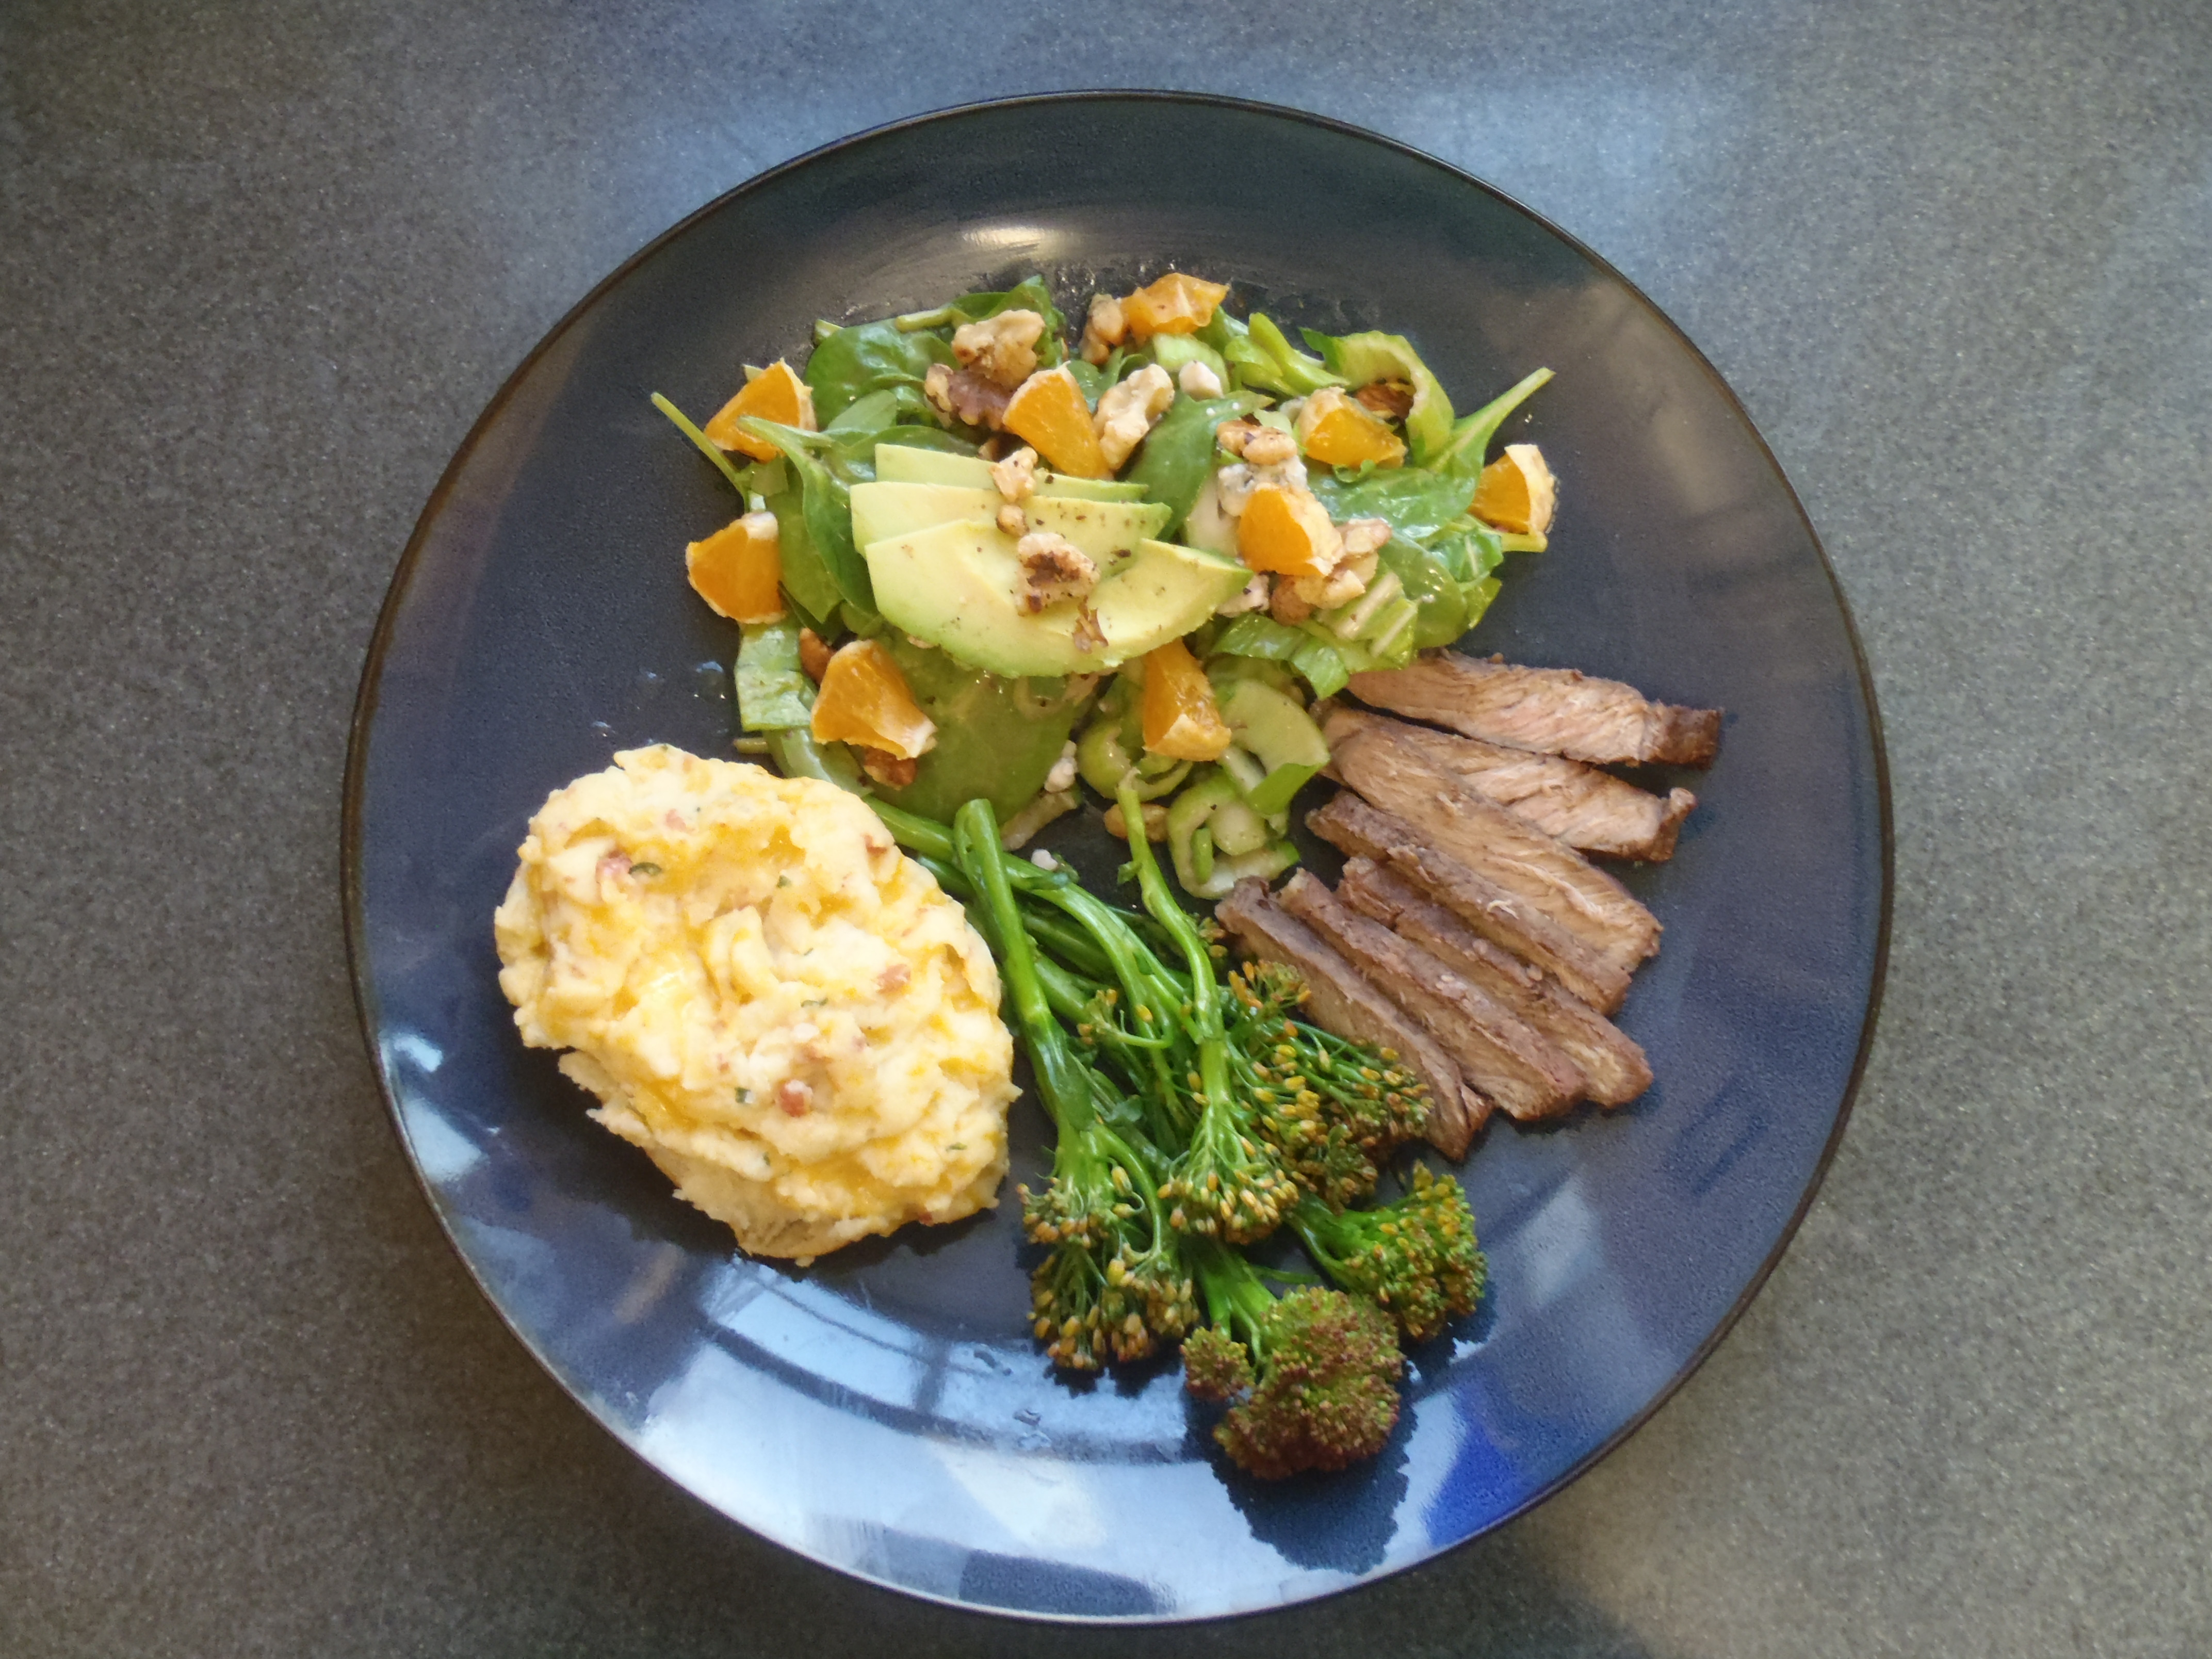 Healthy Steak Dinner  Healthy Steak Dinner